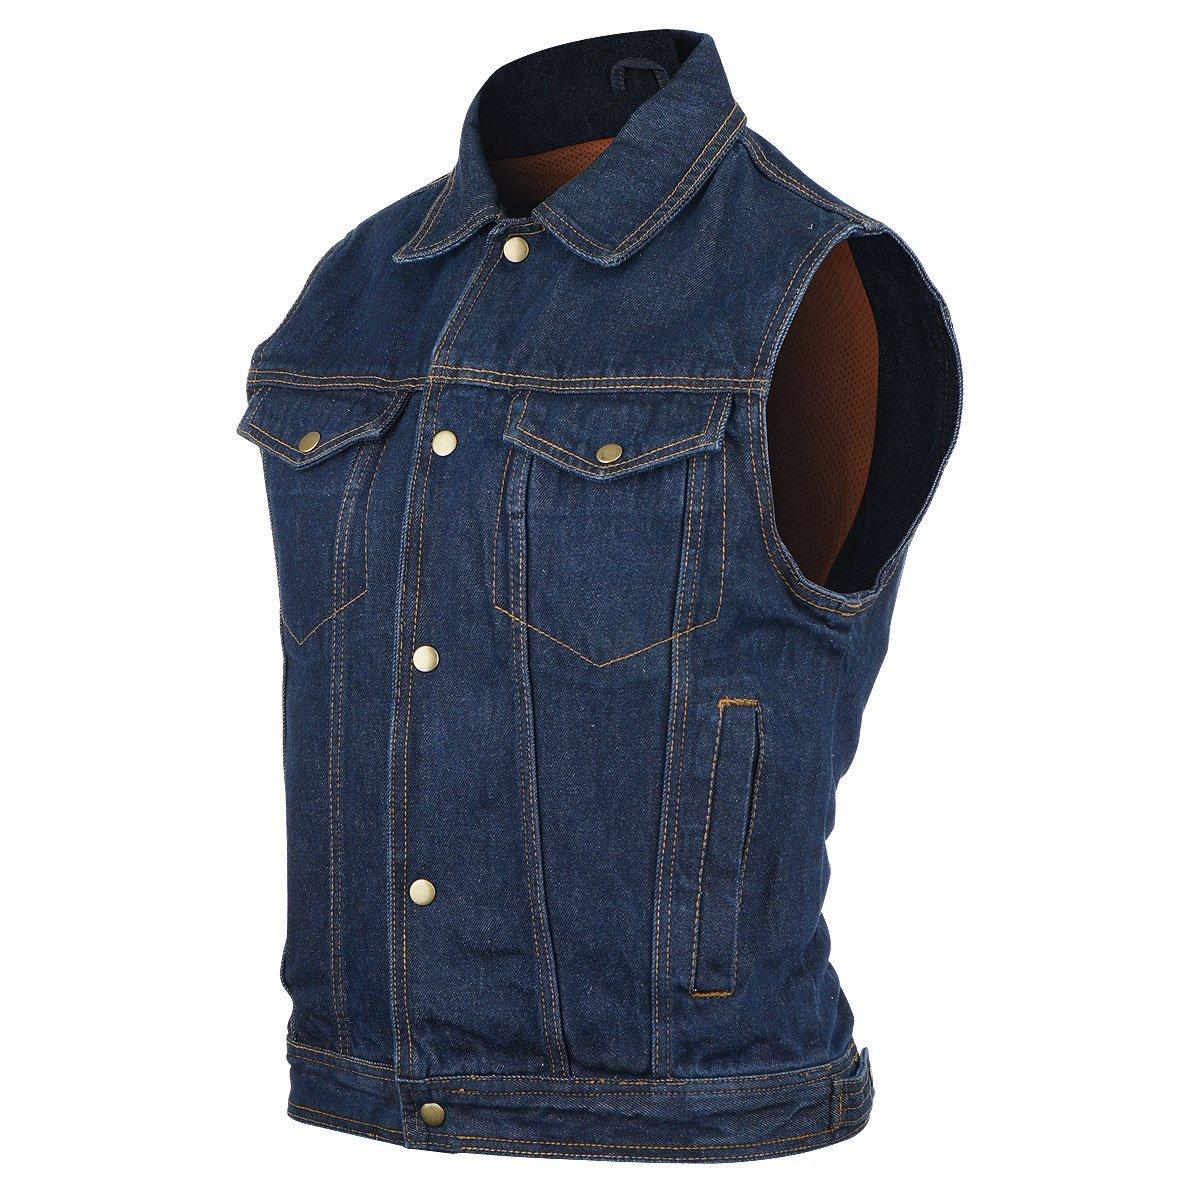 amazon.com: mens blue denim jean vest xs: sports u0026 outdoors nmltkel